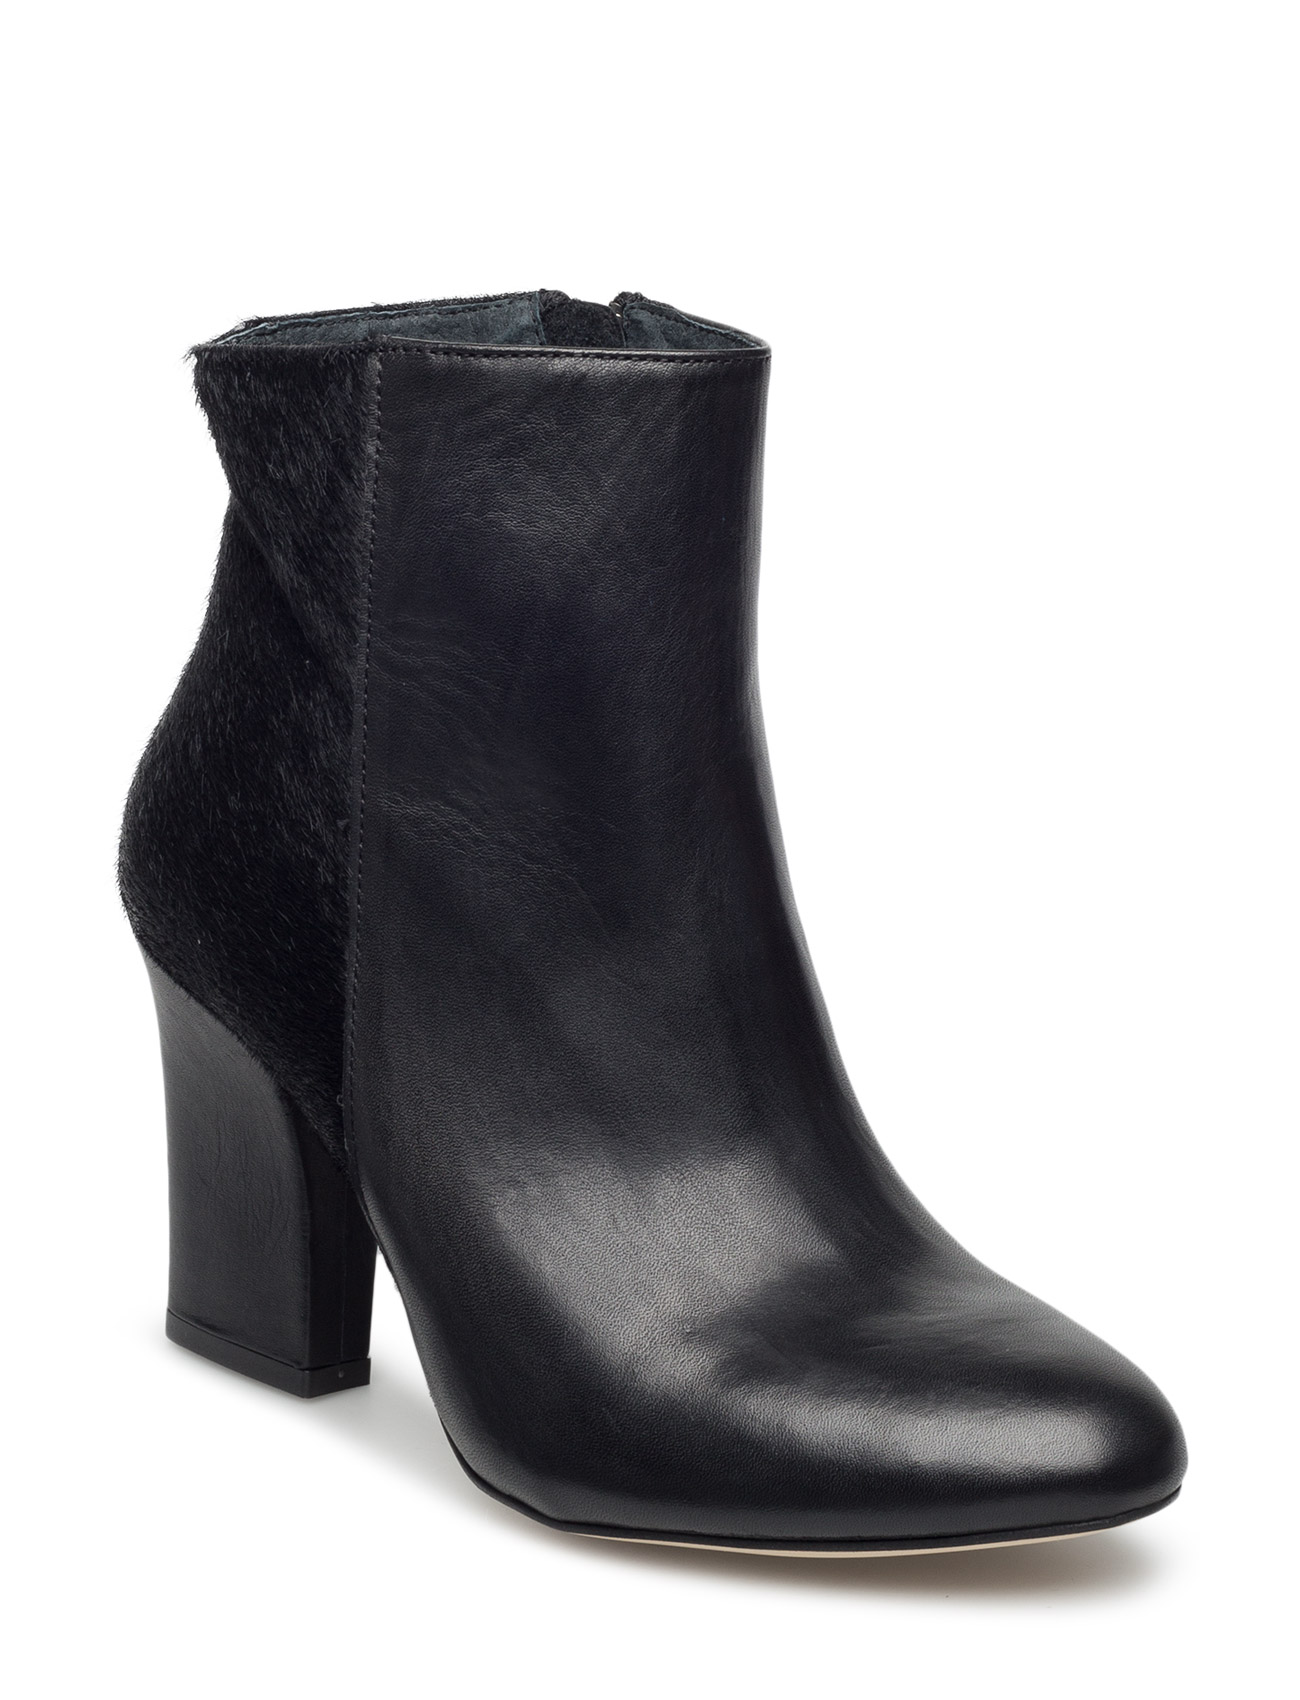 Heeled Boot W Detail UNMADE Copenhagen Støvler til Kvinder i Grå